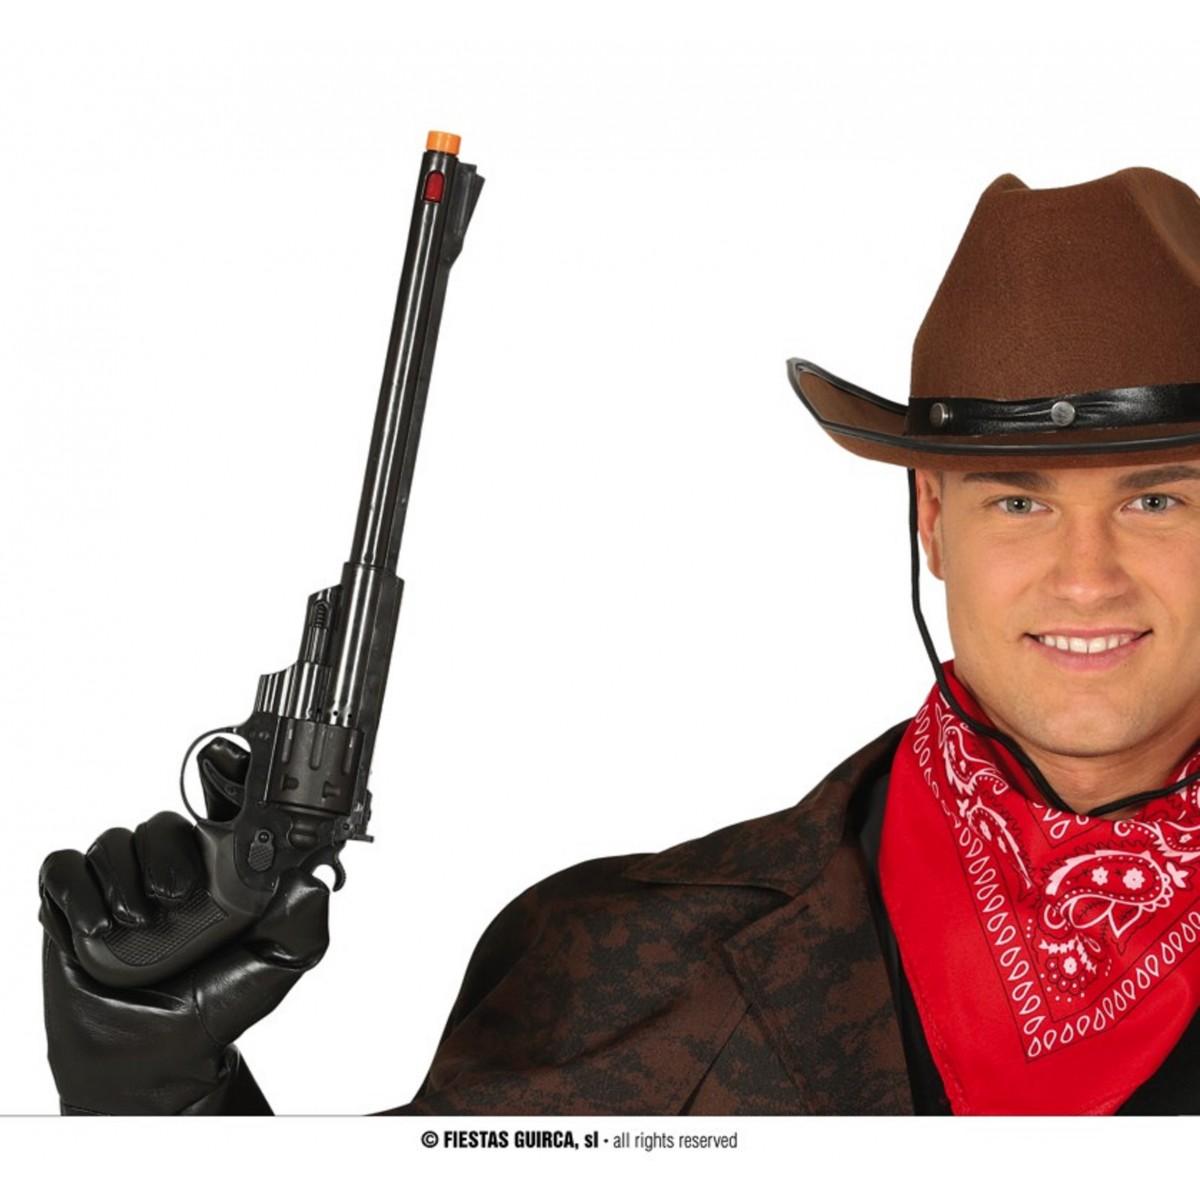 Pistola cow-boy a canne larghe 43cm